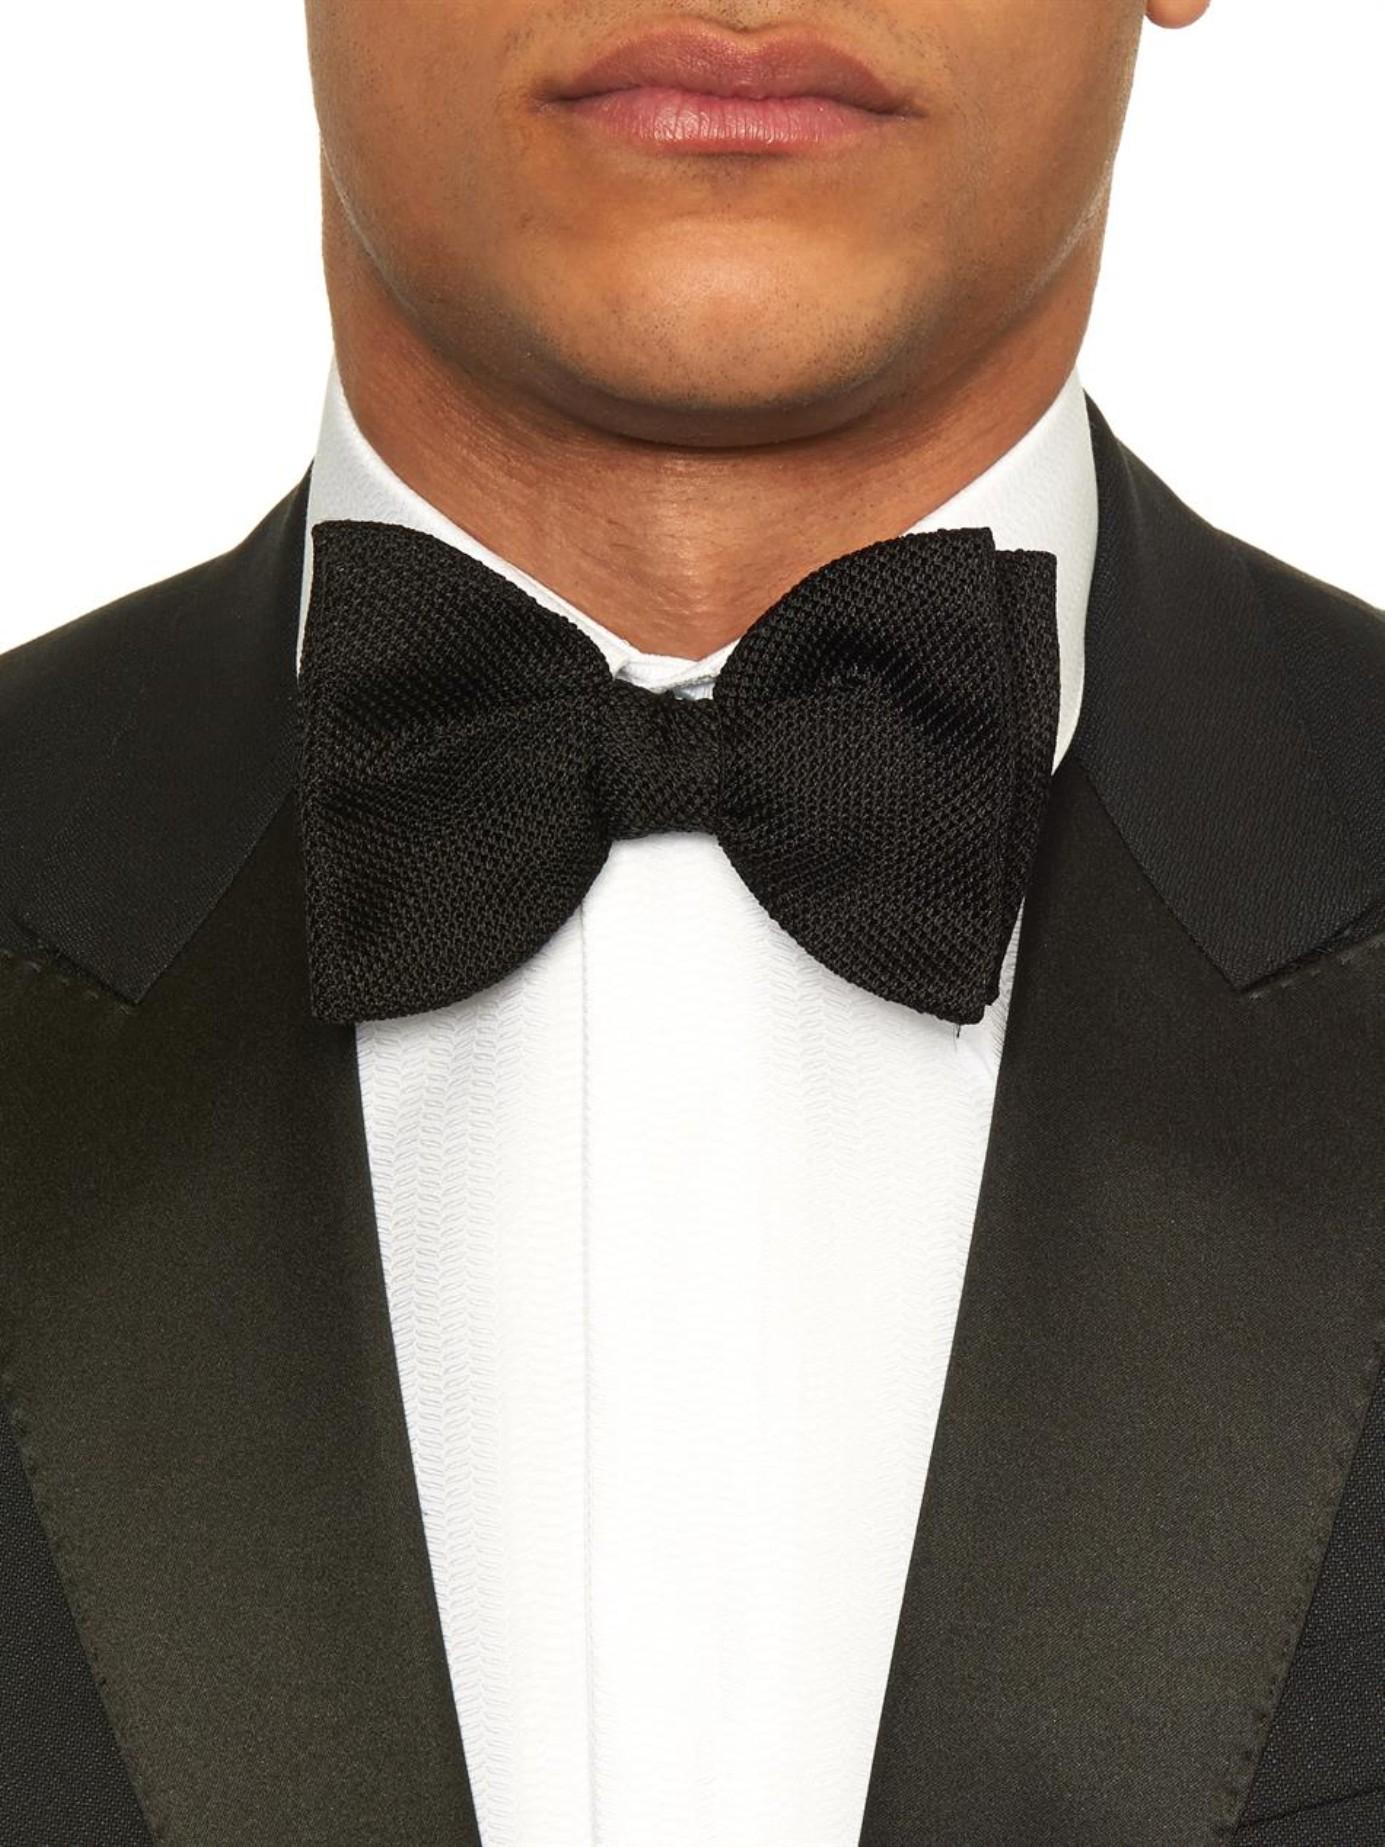 e34cbf326928 Lanvin Knitted Silk Bow Tie in Black for Men - Lyst